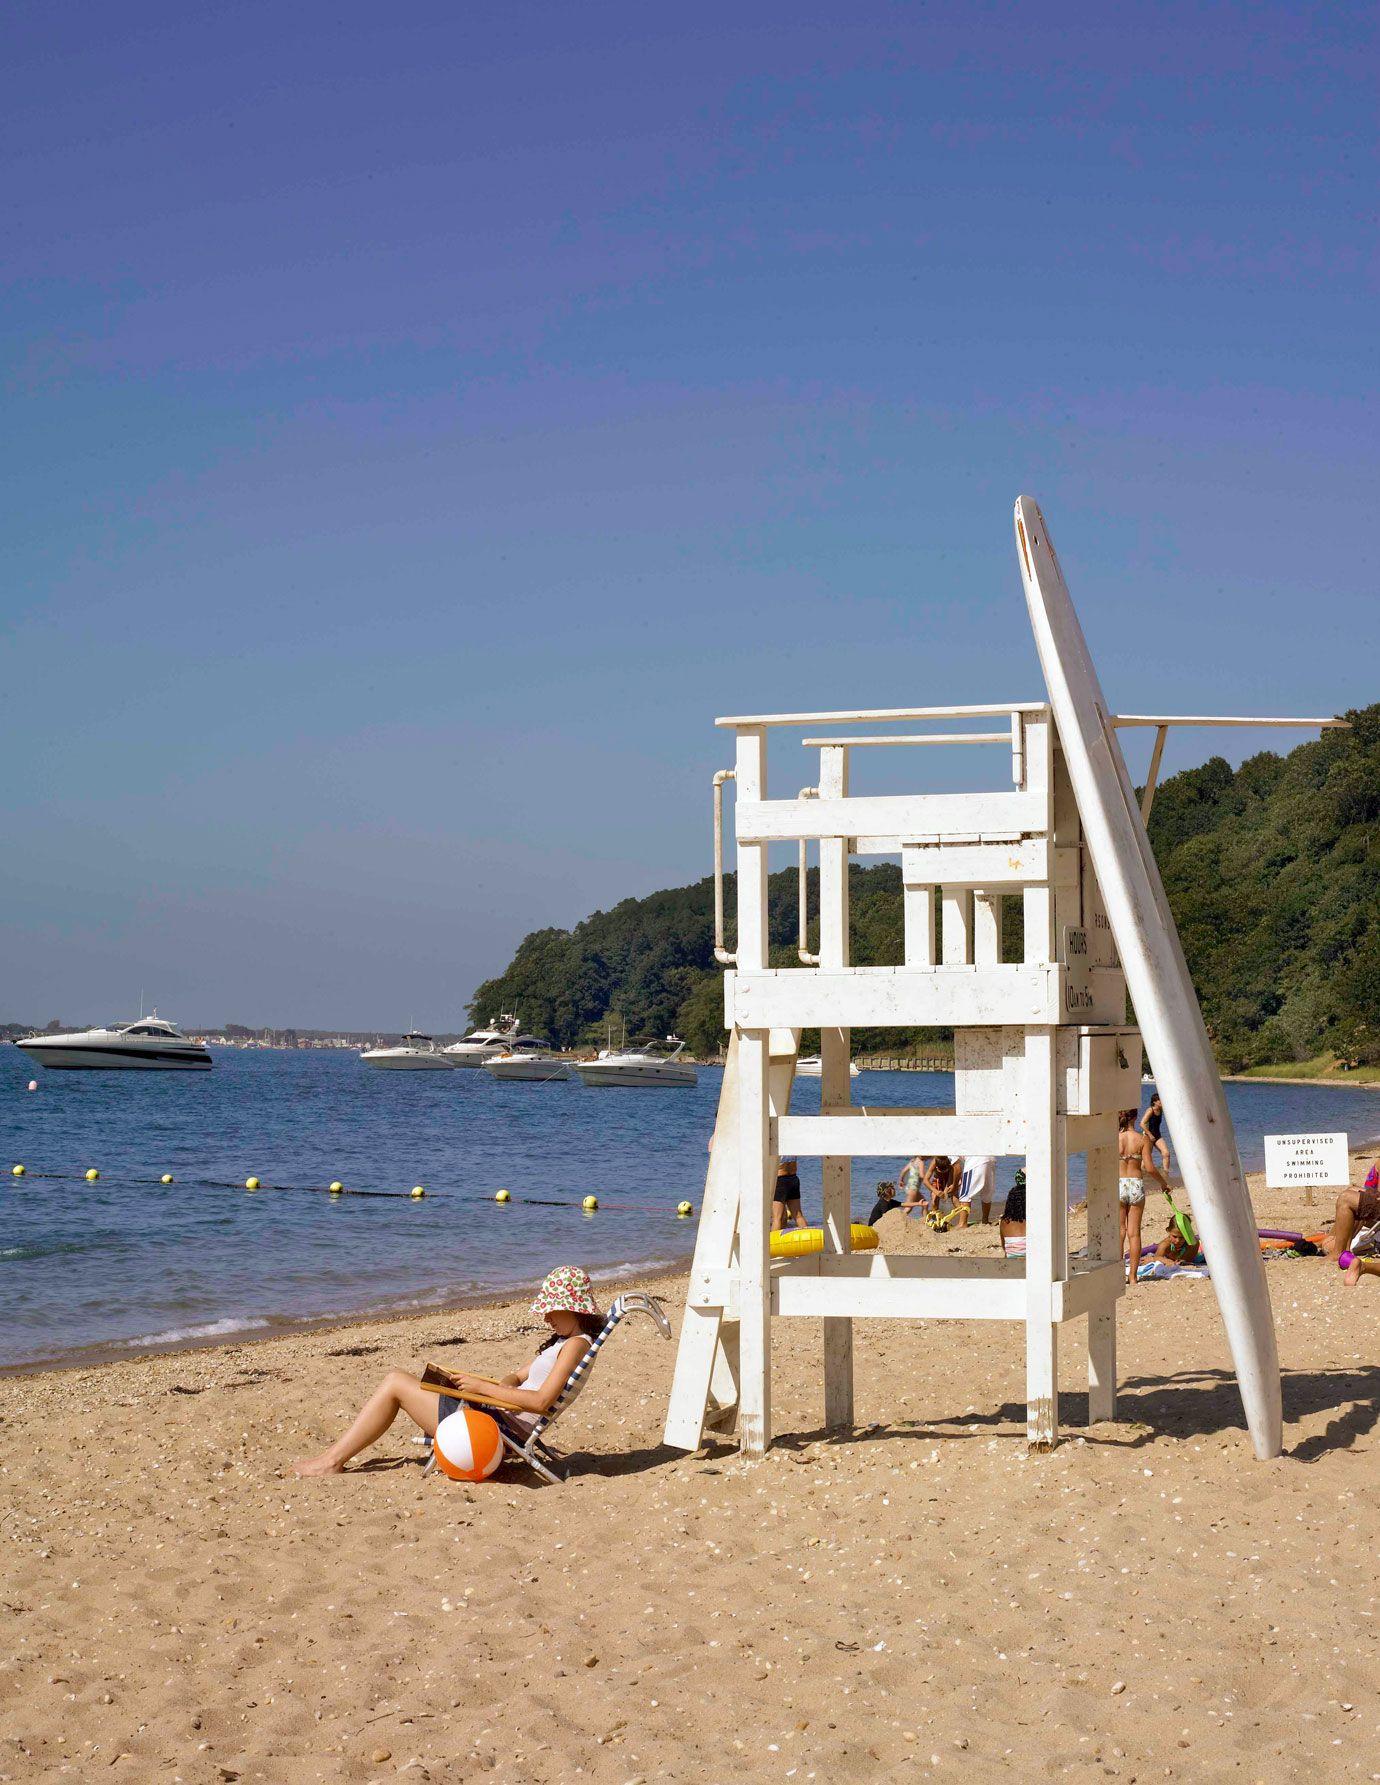 Sunset Beach Hotel In Shelter Island Ny